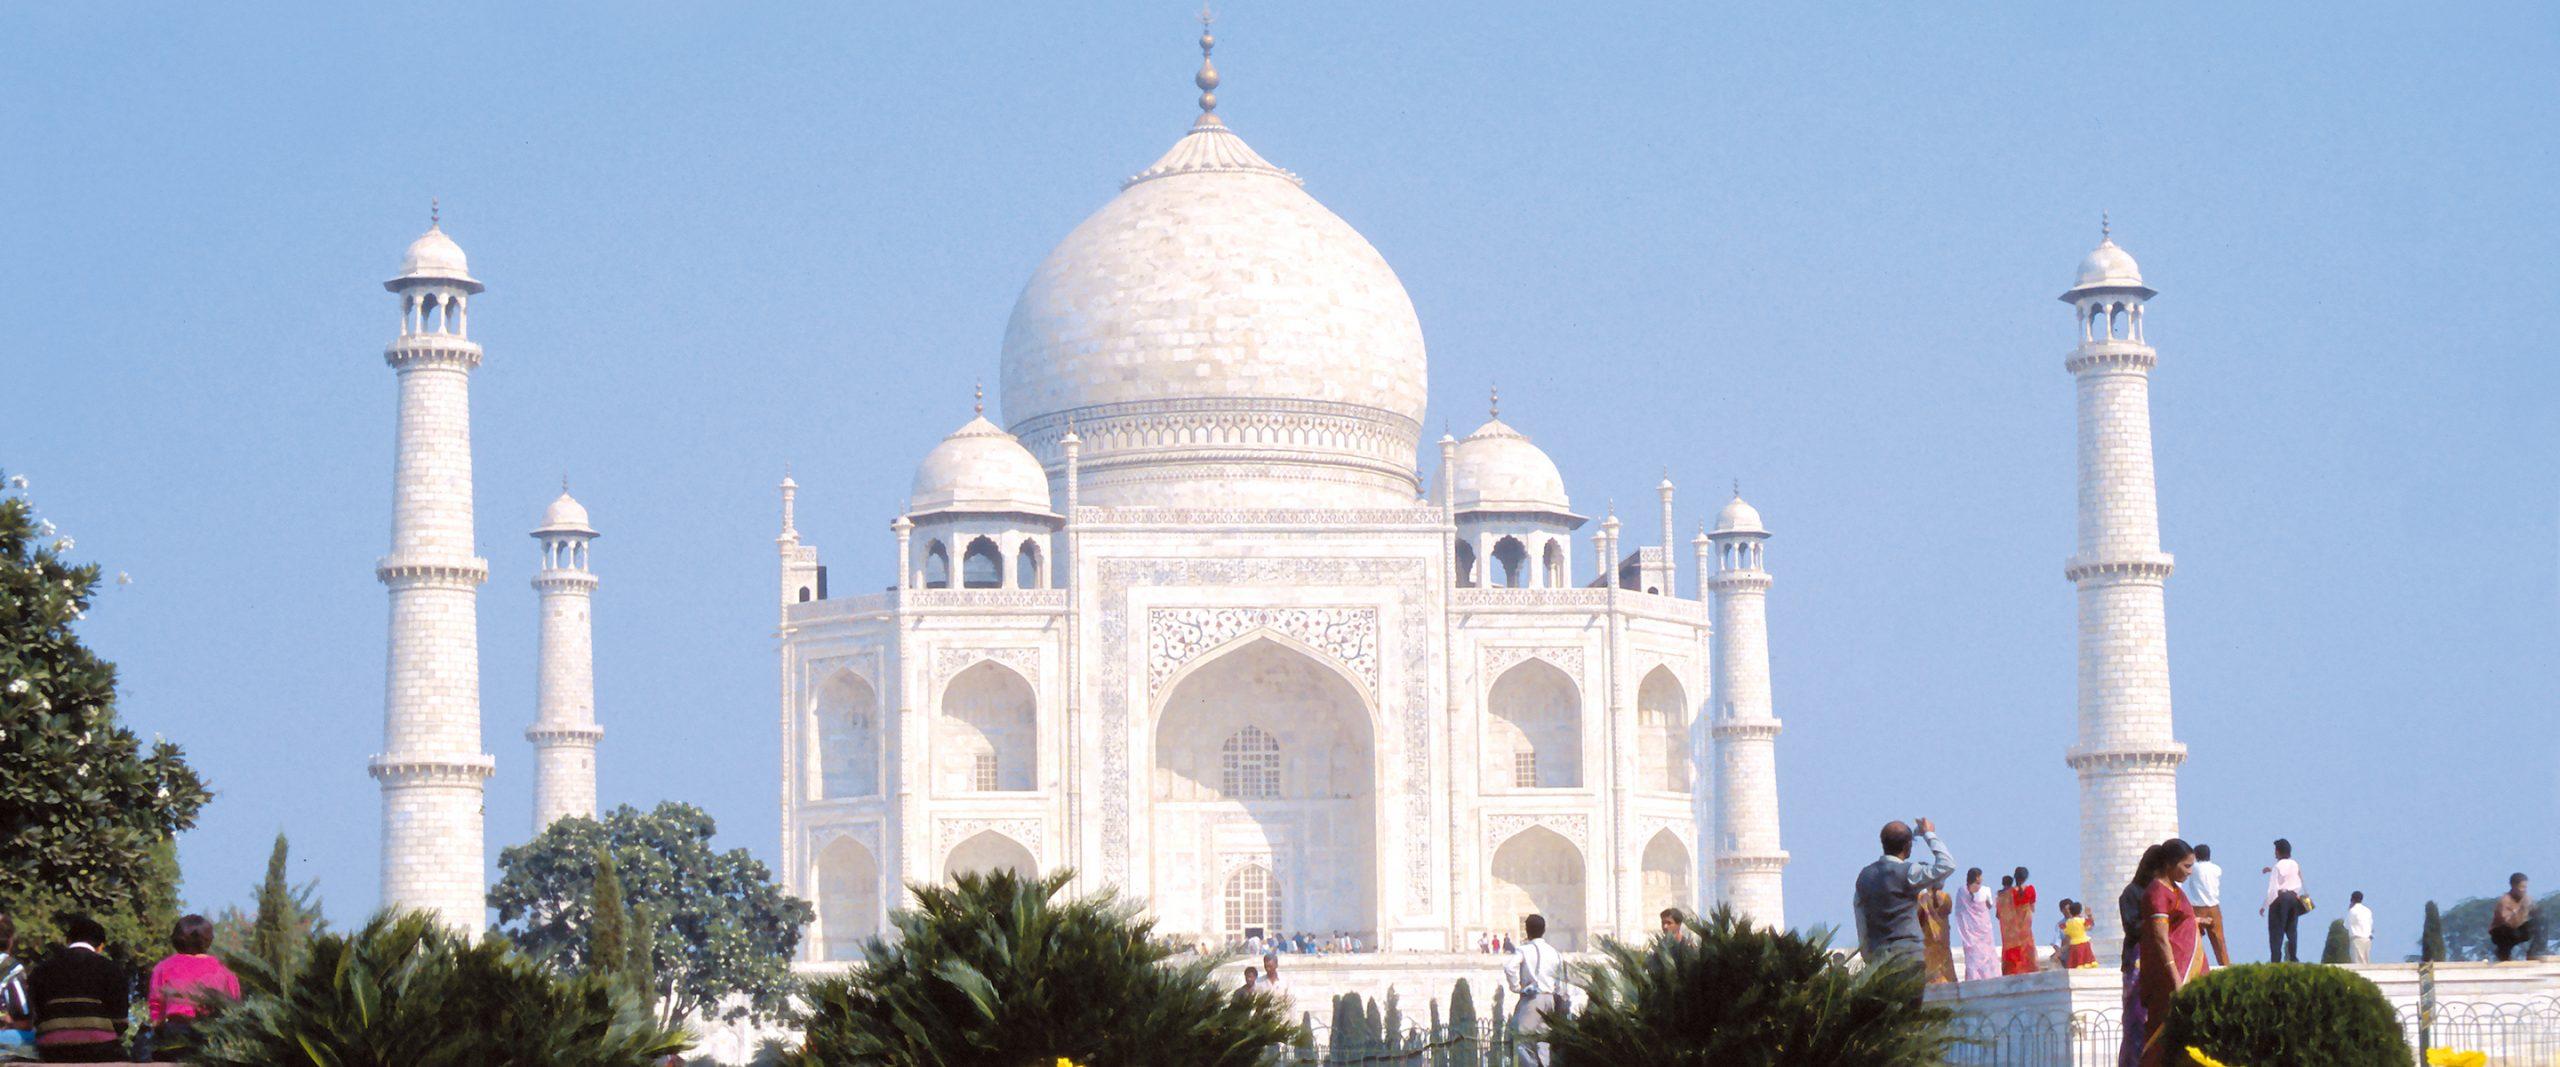 Gruppenreise Indien - Taj Mahal